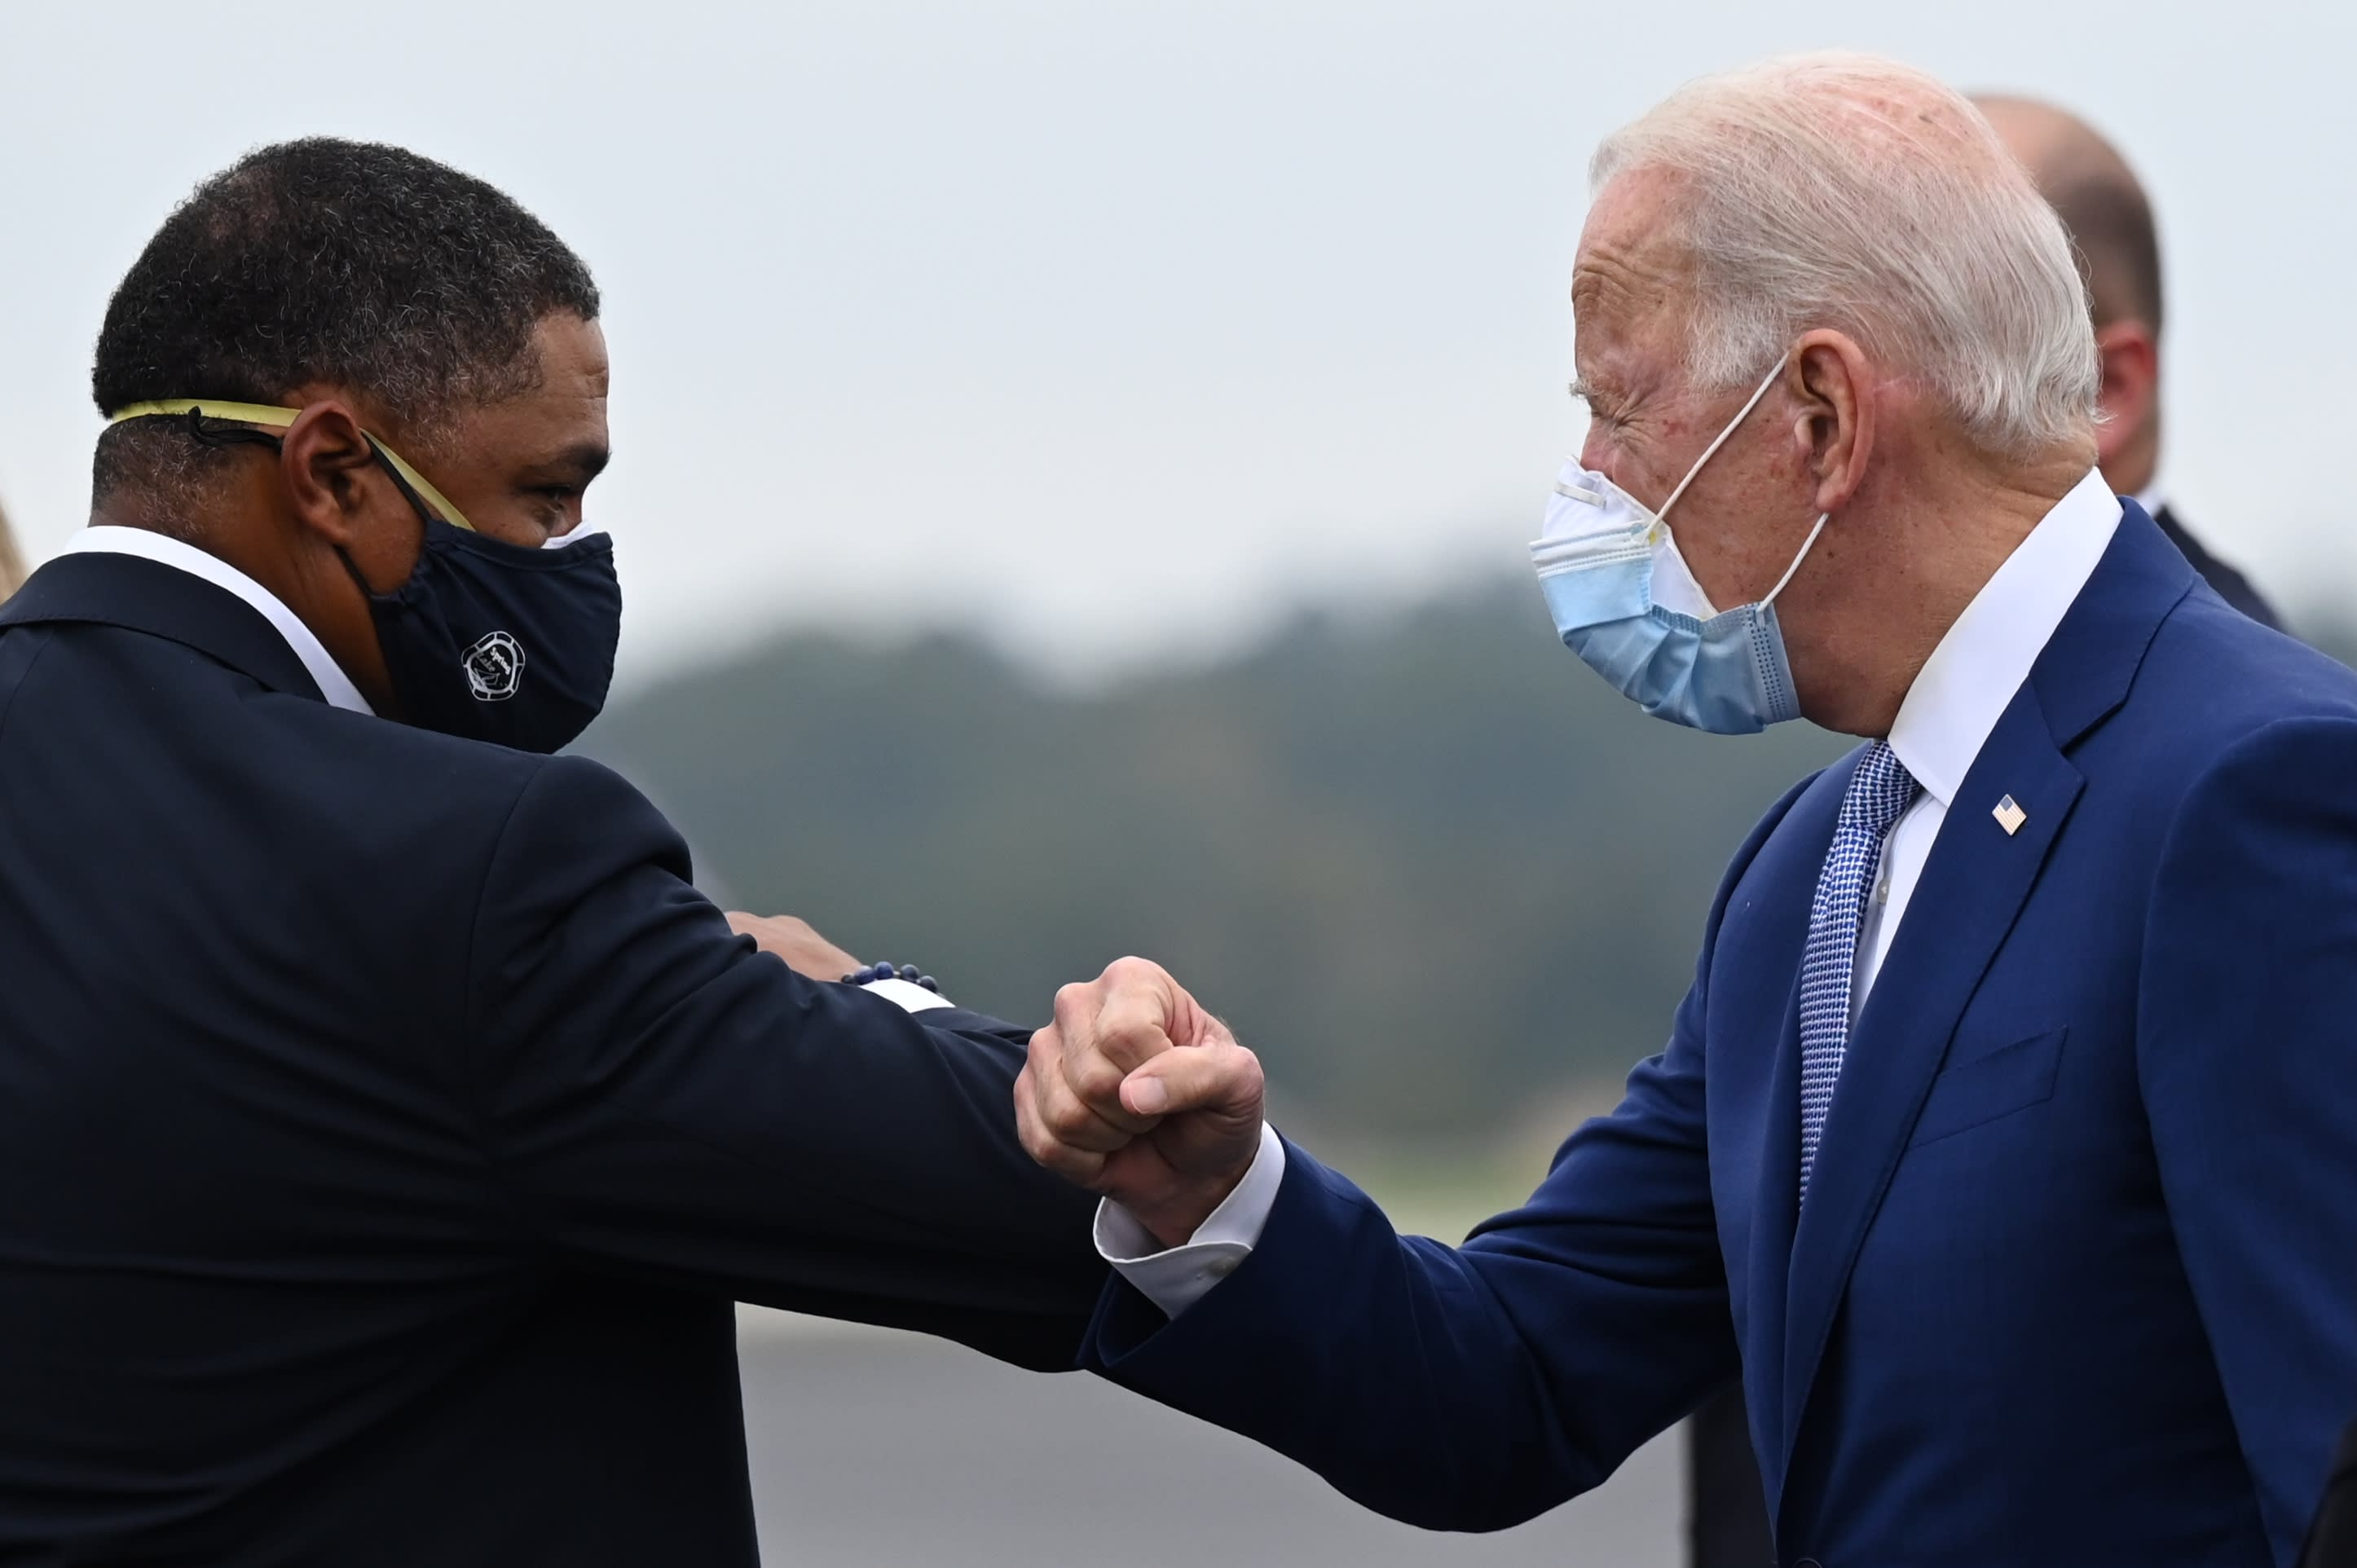 Biden picks for senior White House staff include loyalists, rising Democratic stars